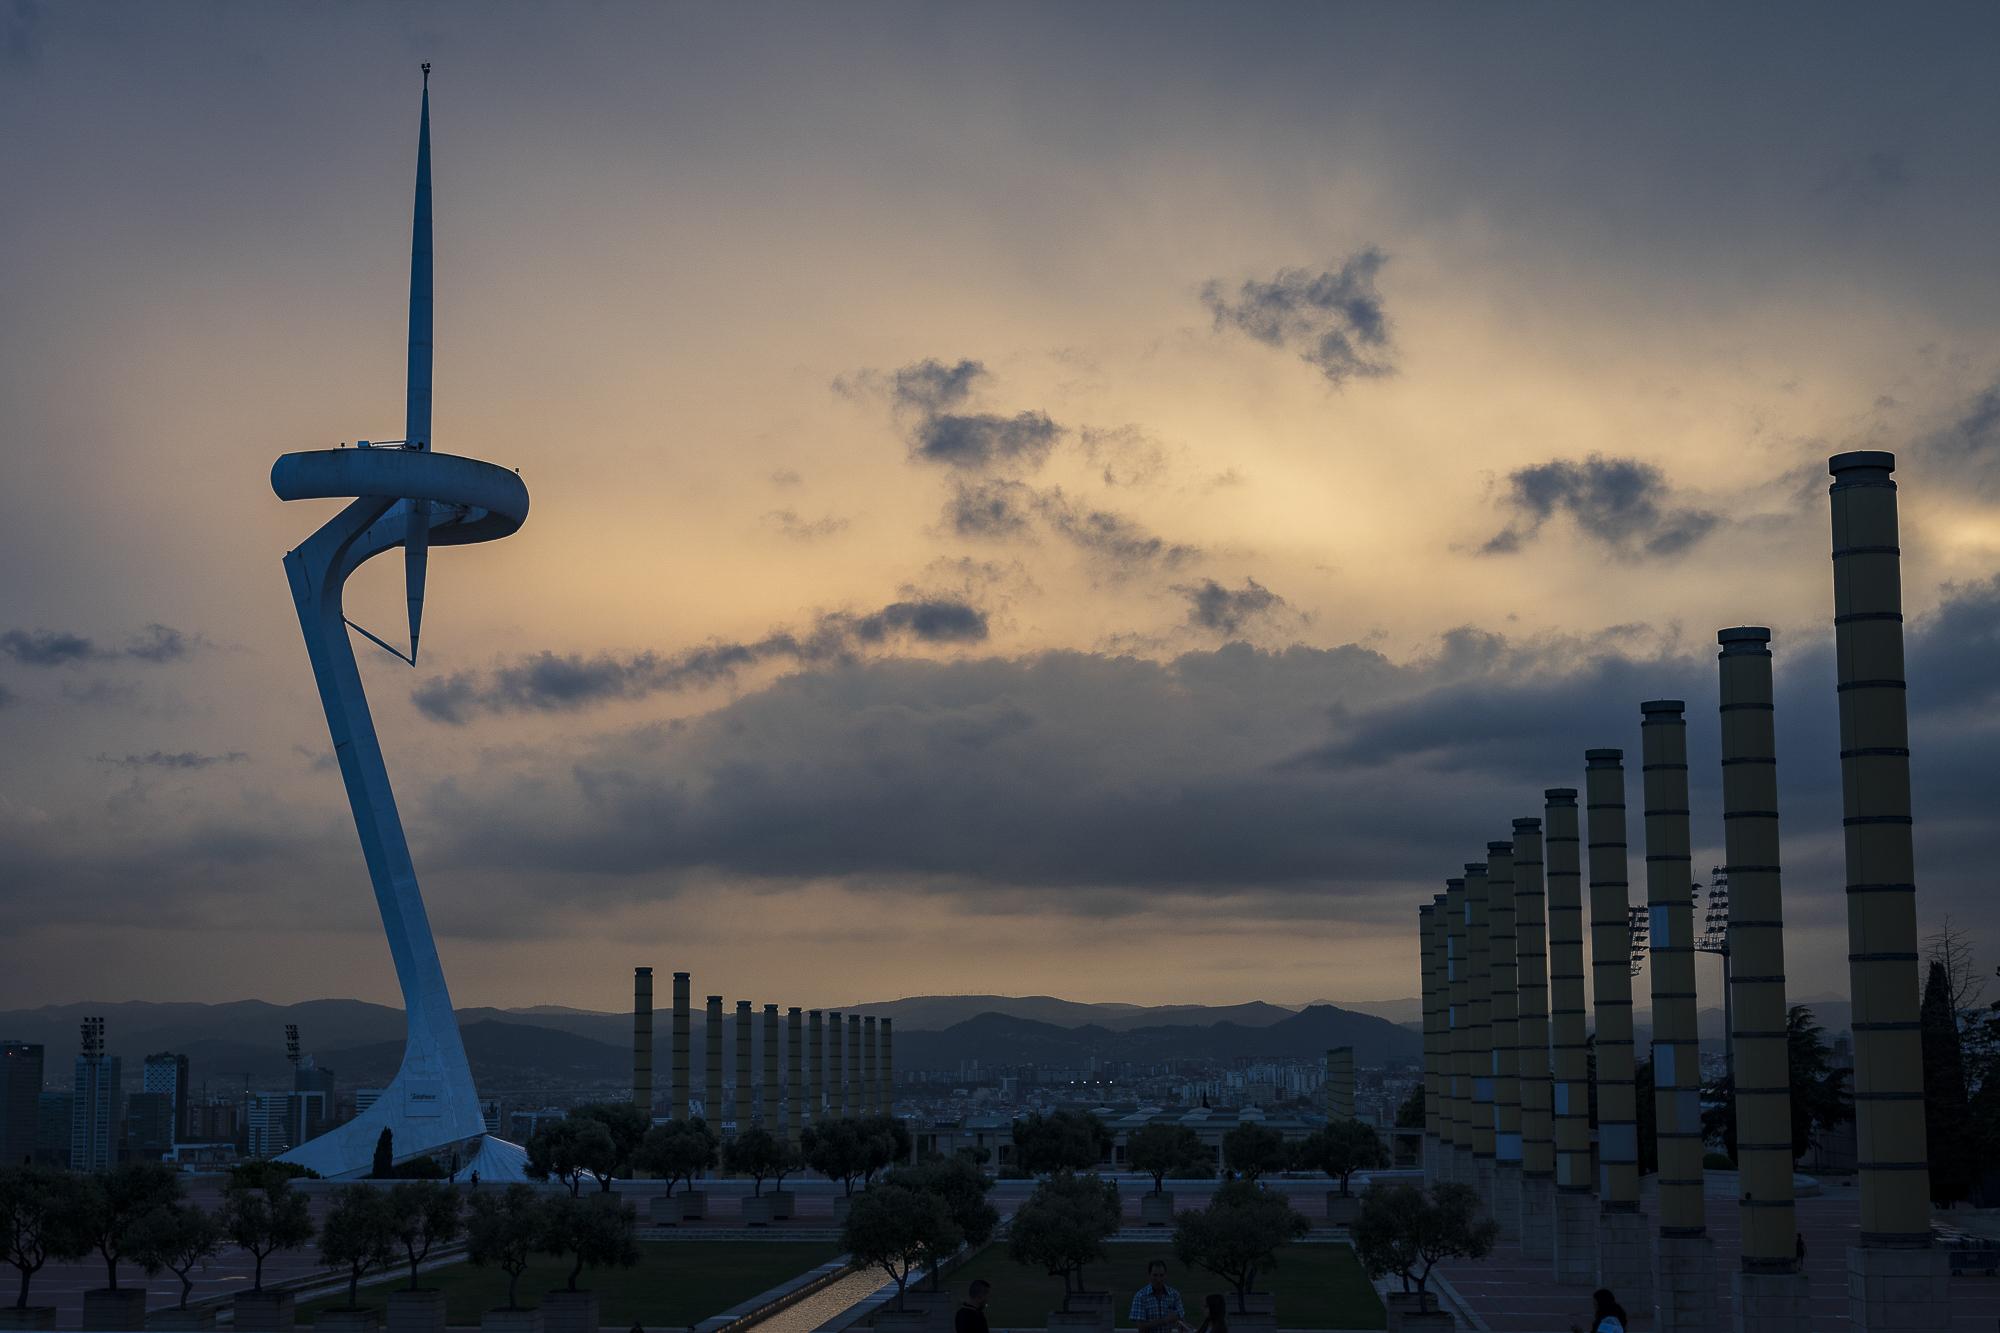 Barcelona- Alexander-005-aperture-tours.jpg